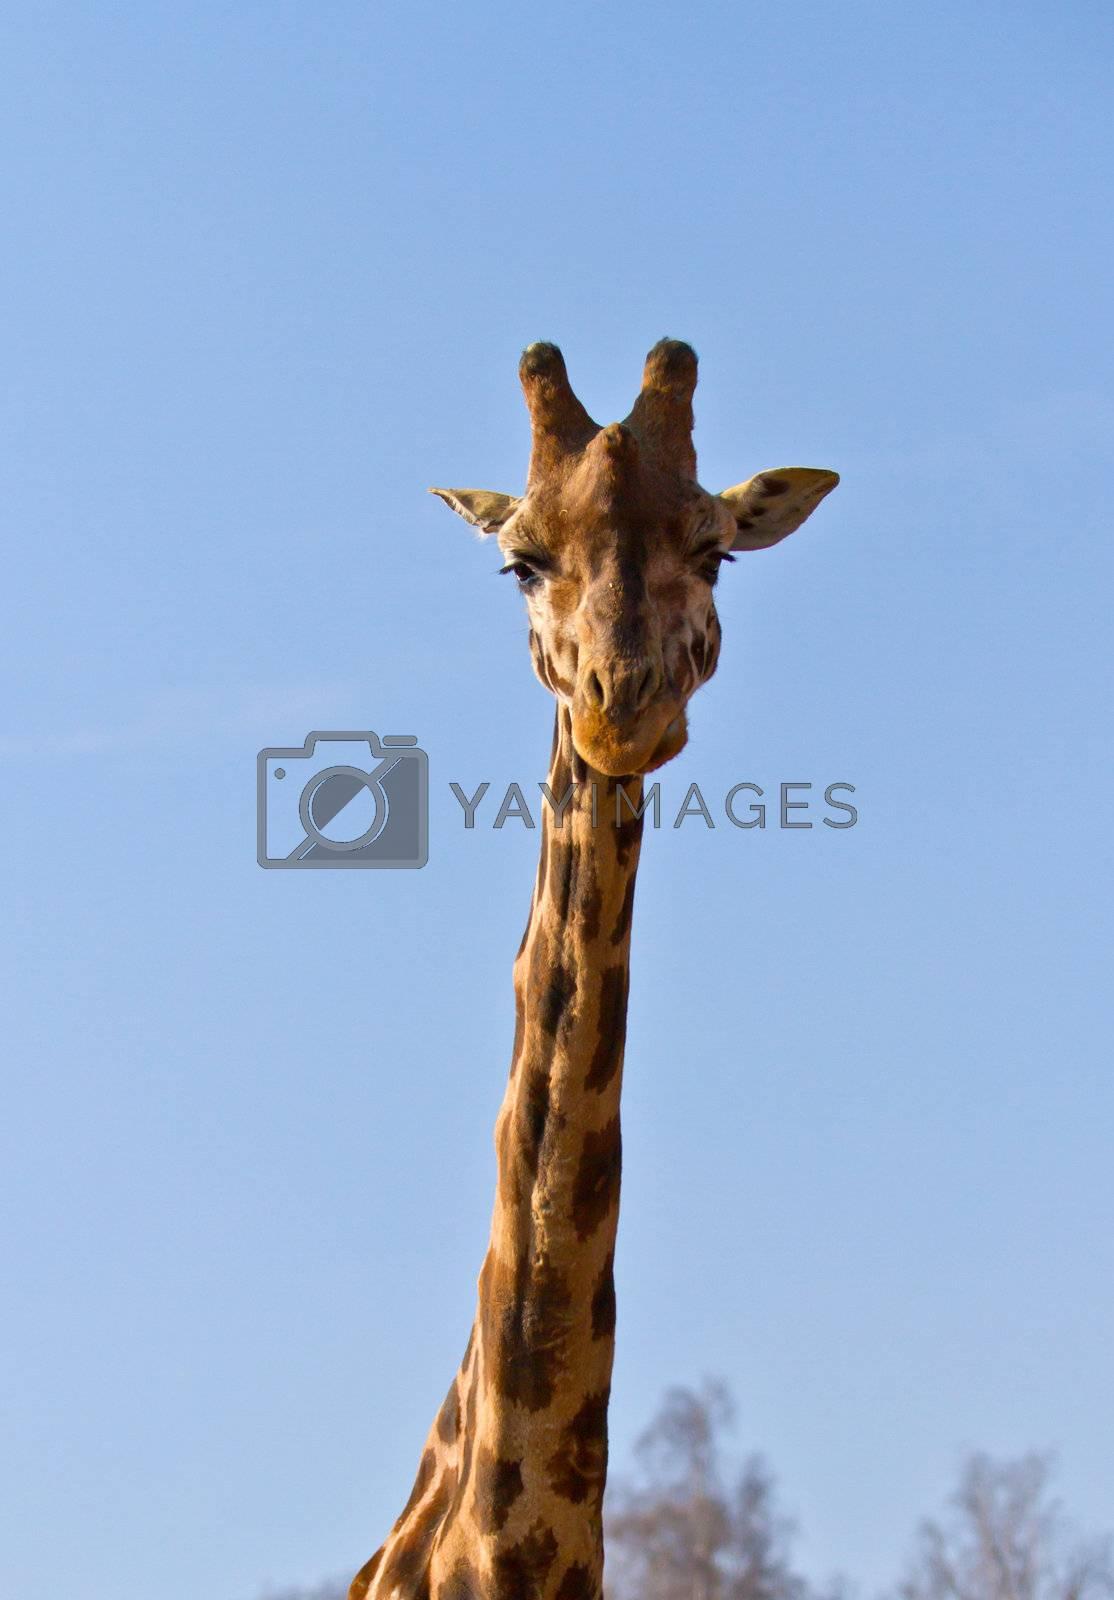 Funny giraffe's face